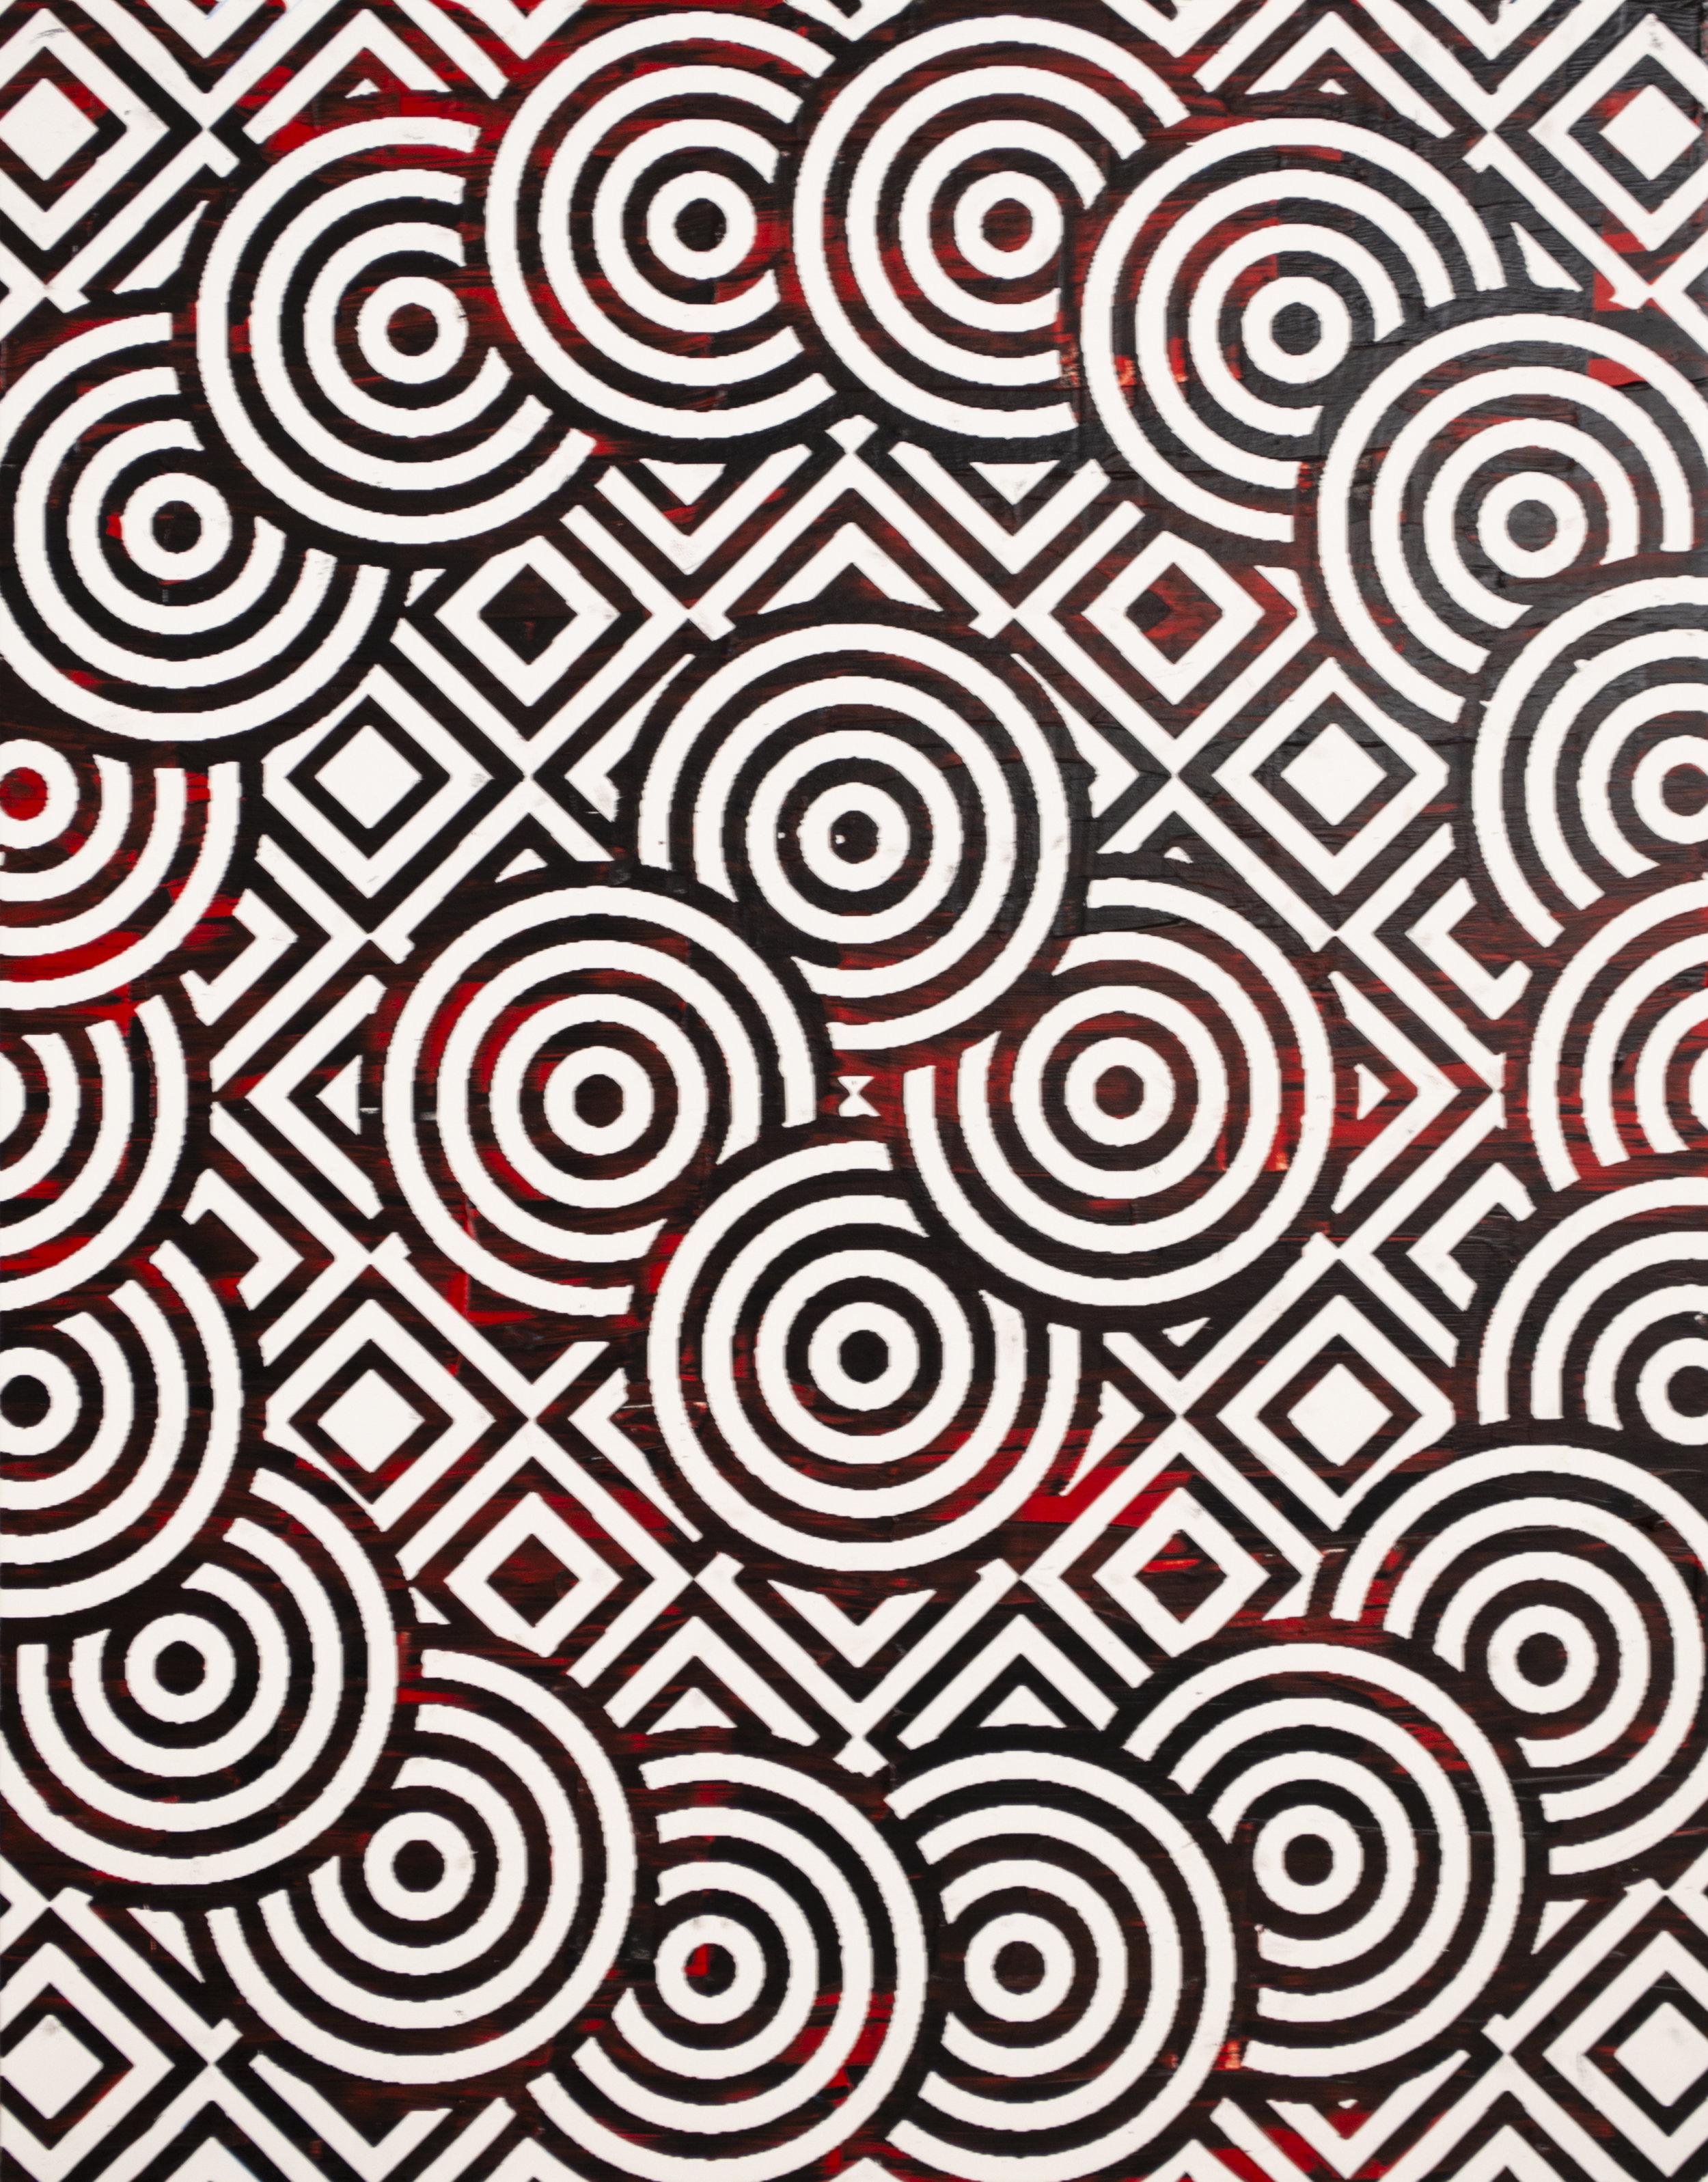 HUE Gallery of Contemporary Art - Sean Christopher Ward - Circles and Diamonds - Acrylic on MDF - 11x14 - 2018 - $300.jpg